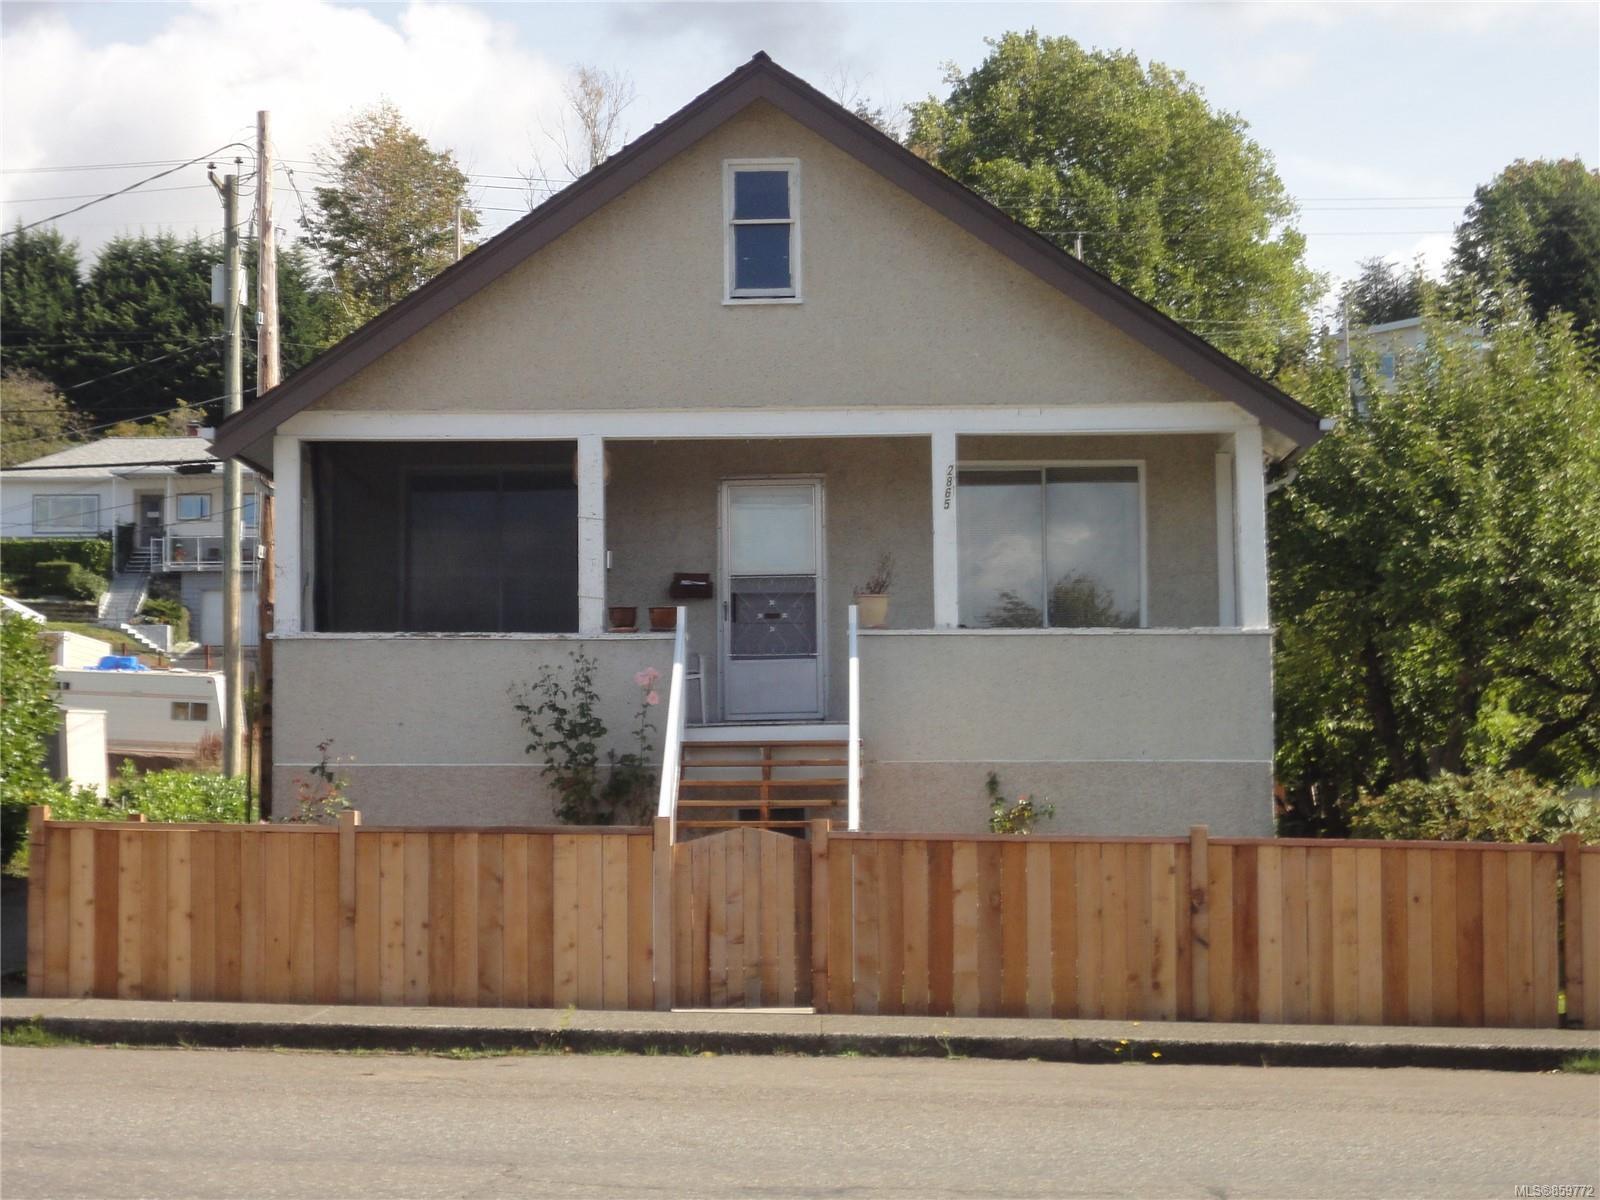 Main Photo: 2865 5th Ave in : PA Port Alberni House for sale (Port Alberni)  : MLS®# 859772